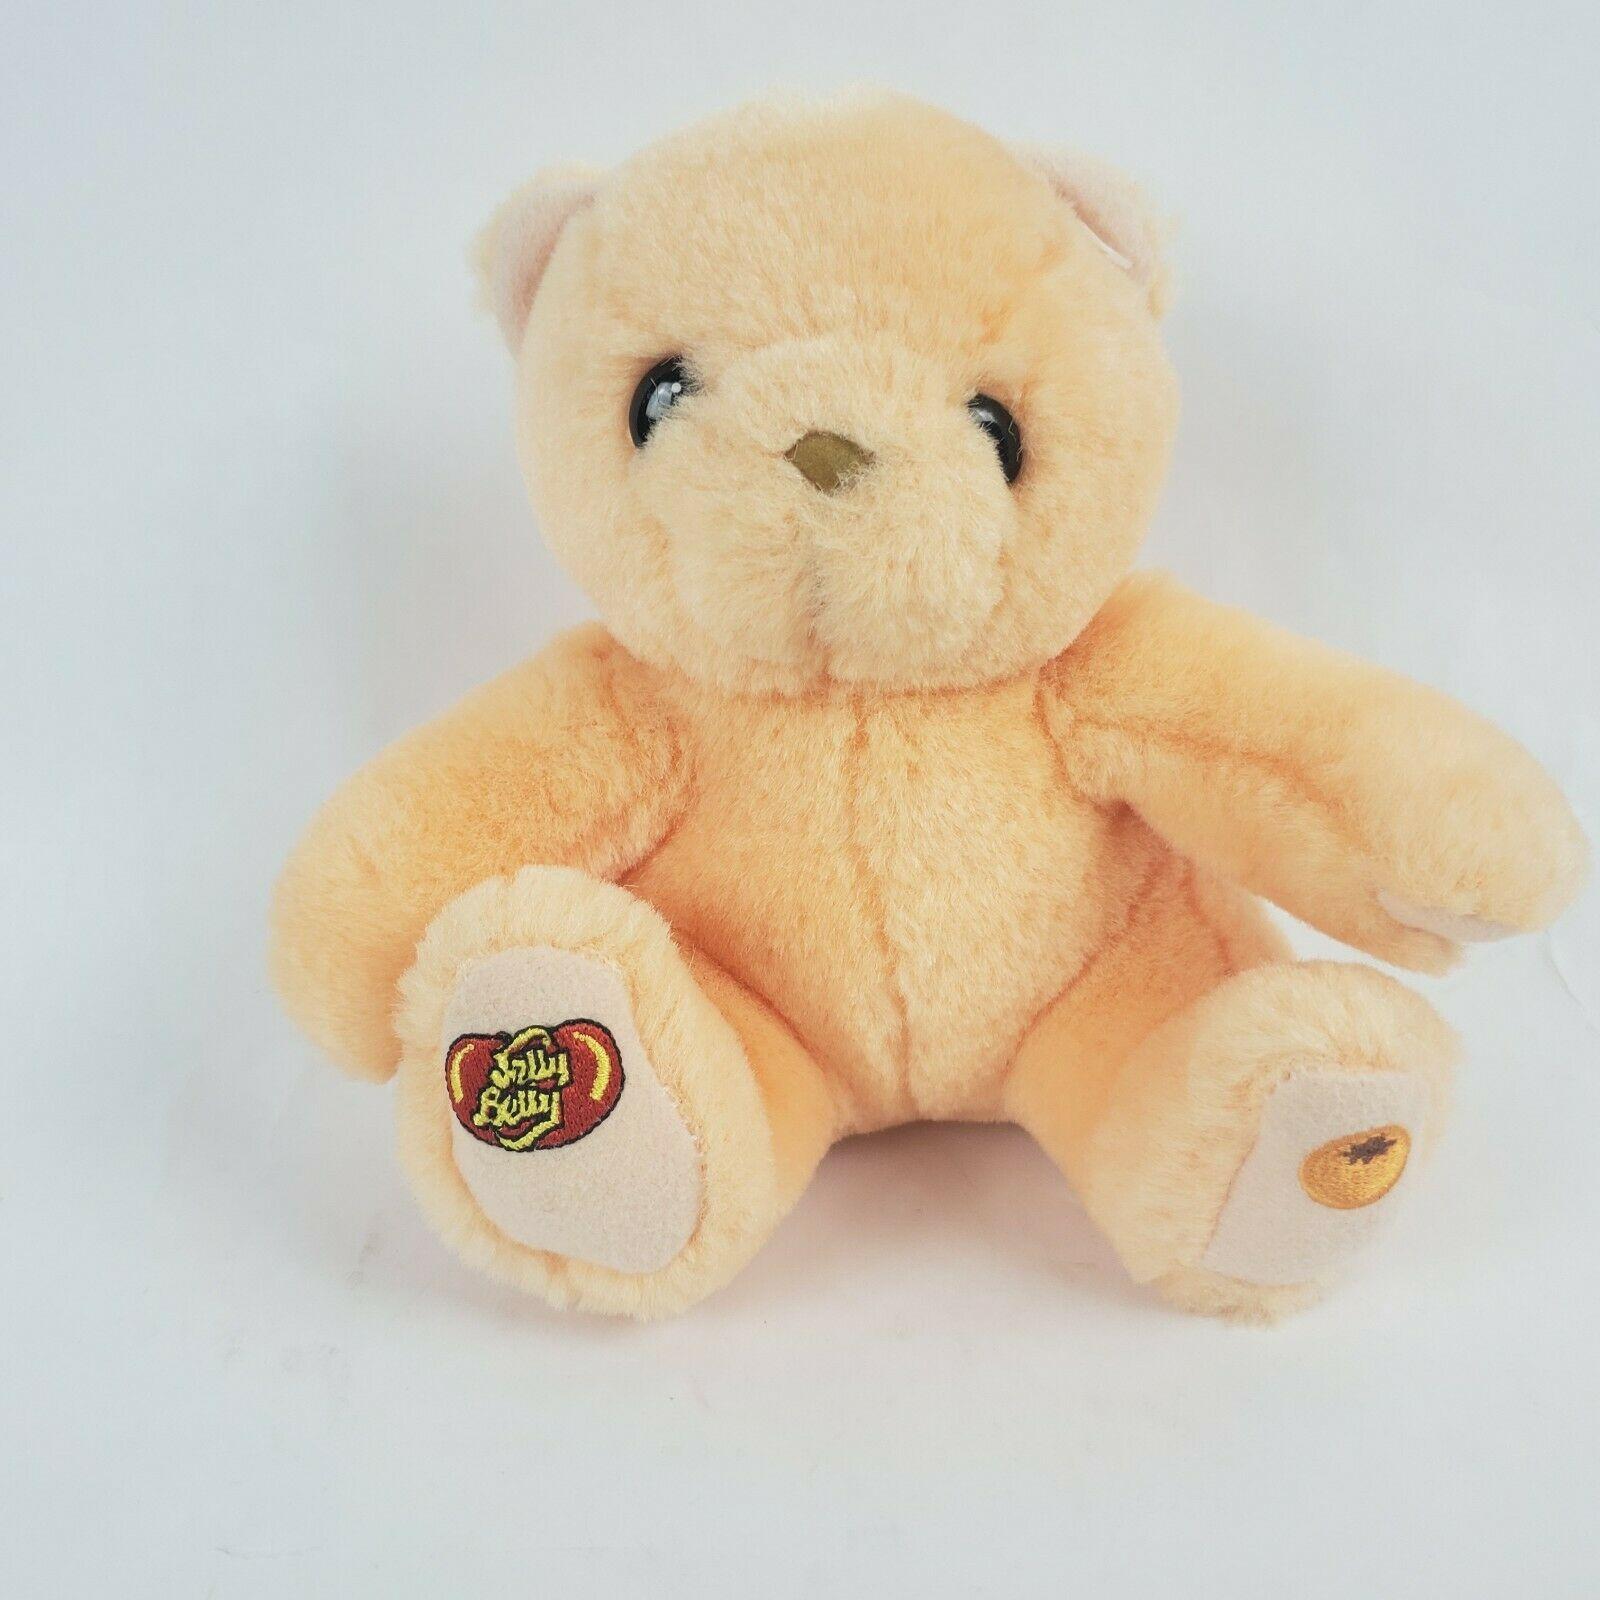 "Jelly Belly Orange Bear 6"" Plush Teddy Stuffed Animal Hermen Goelitz Enesco"